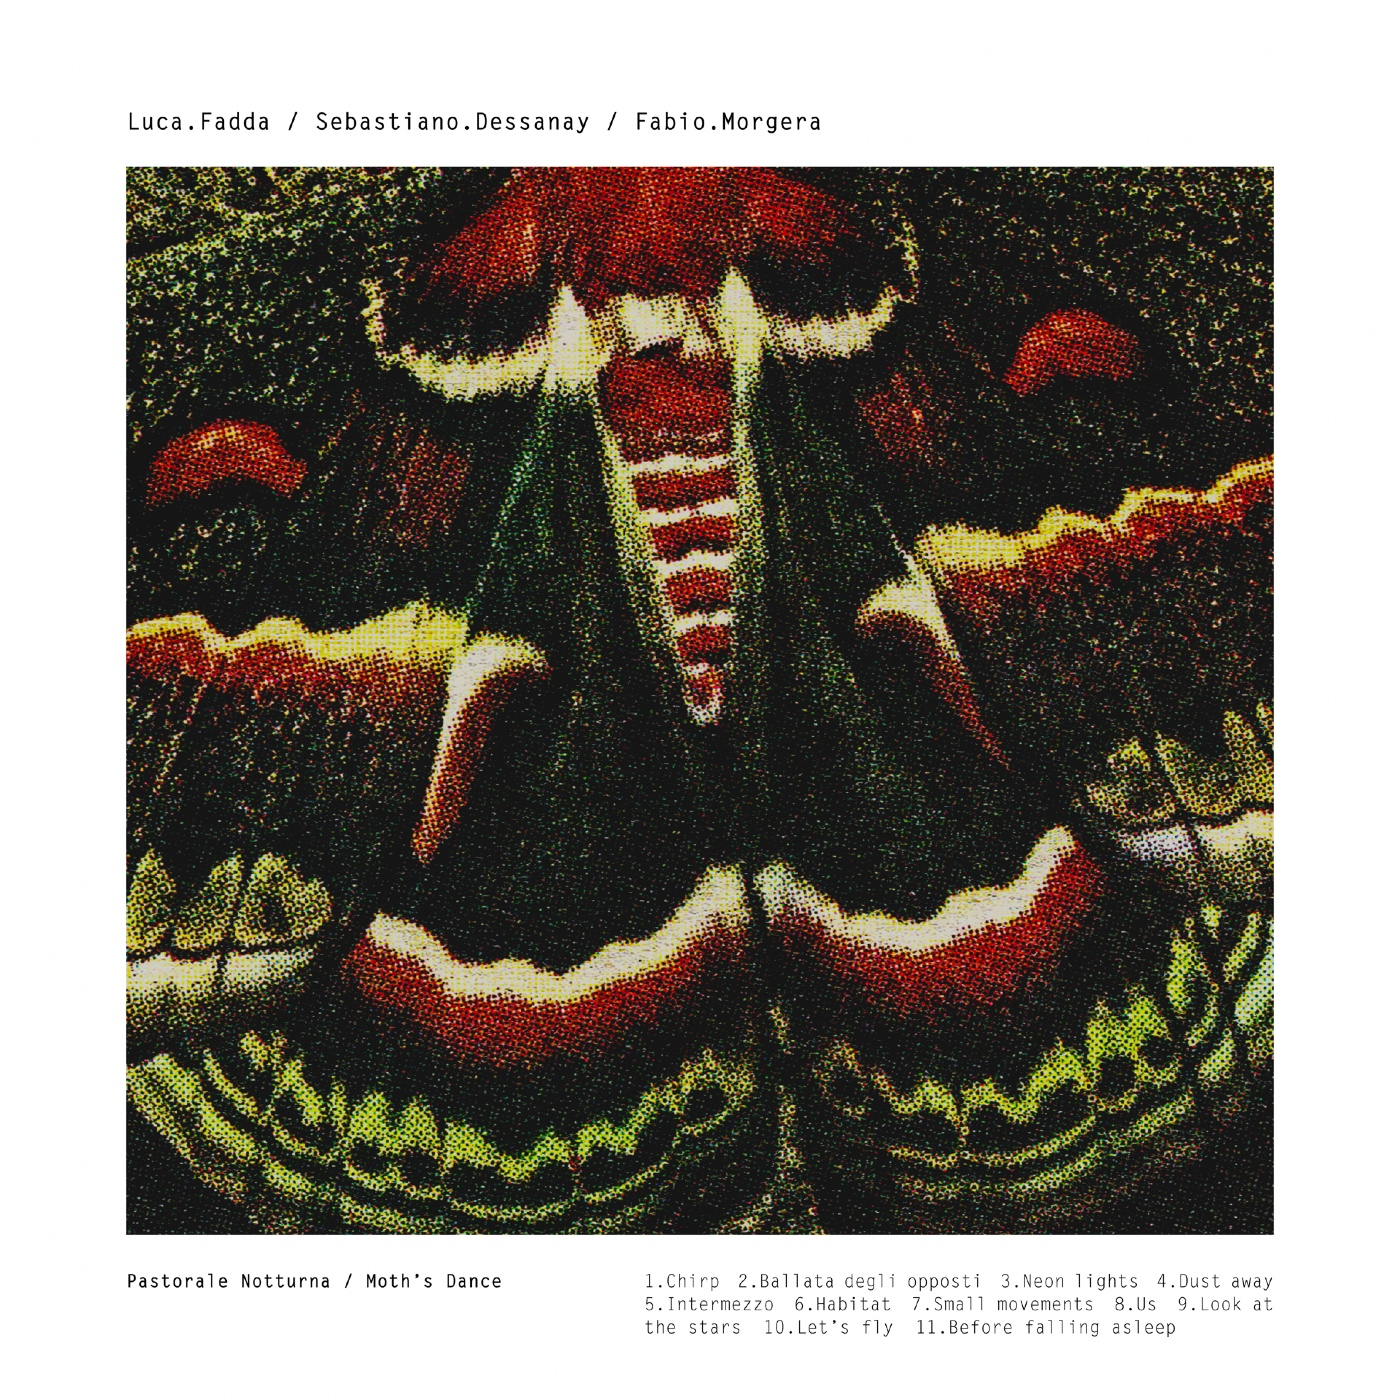 Moths-Dance-Pastorale-Notturna-album-cover